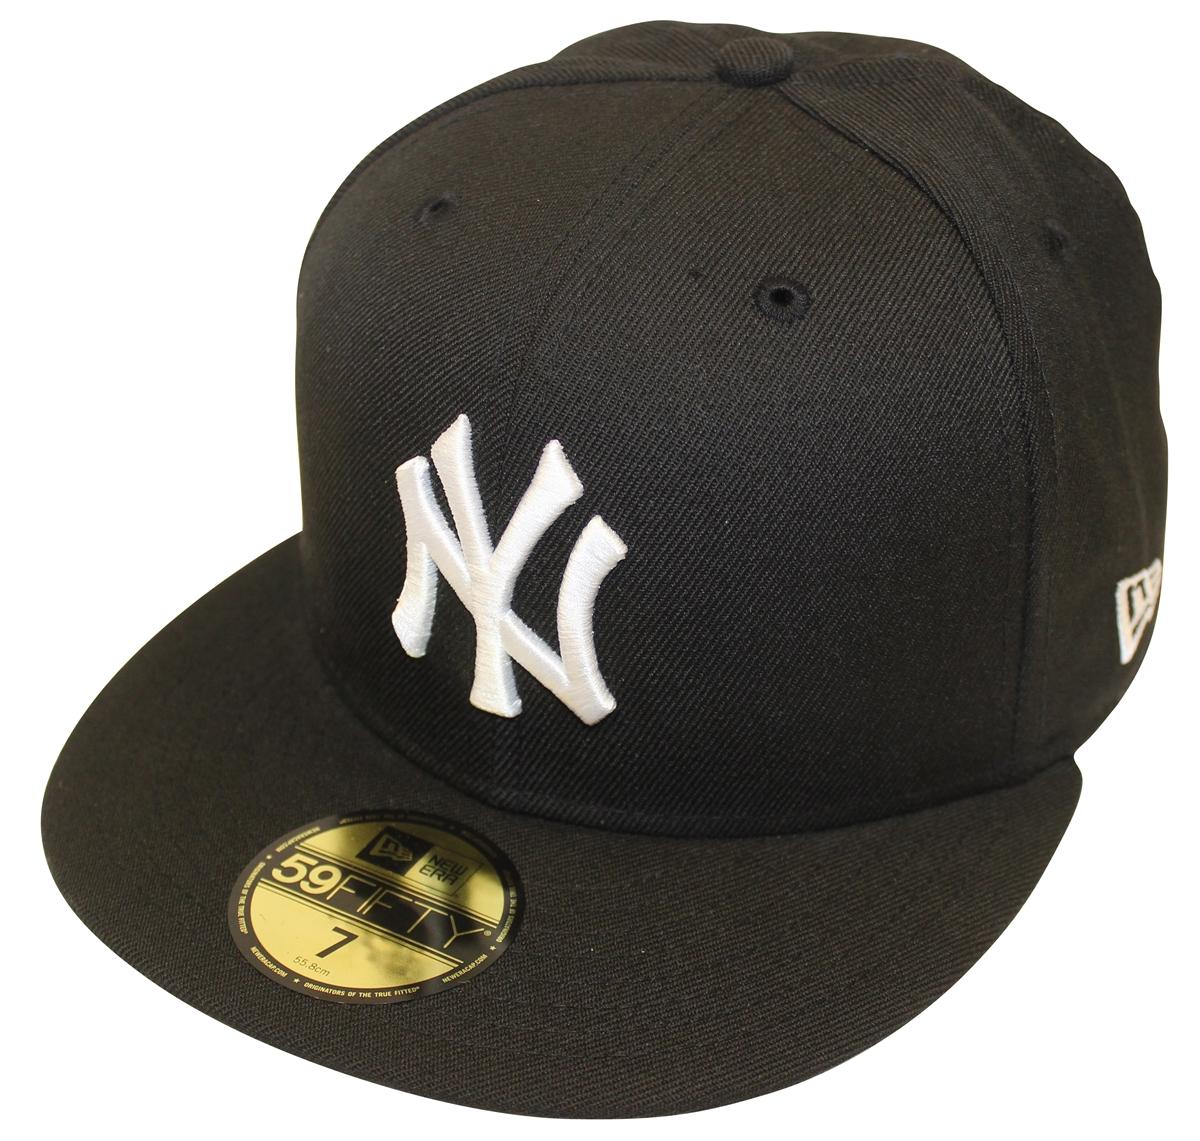 New Era 59Fifty MLB Basic Black White New York Yankees Fitted Cap 66851c6be8e